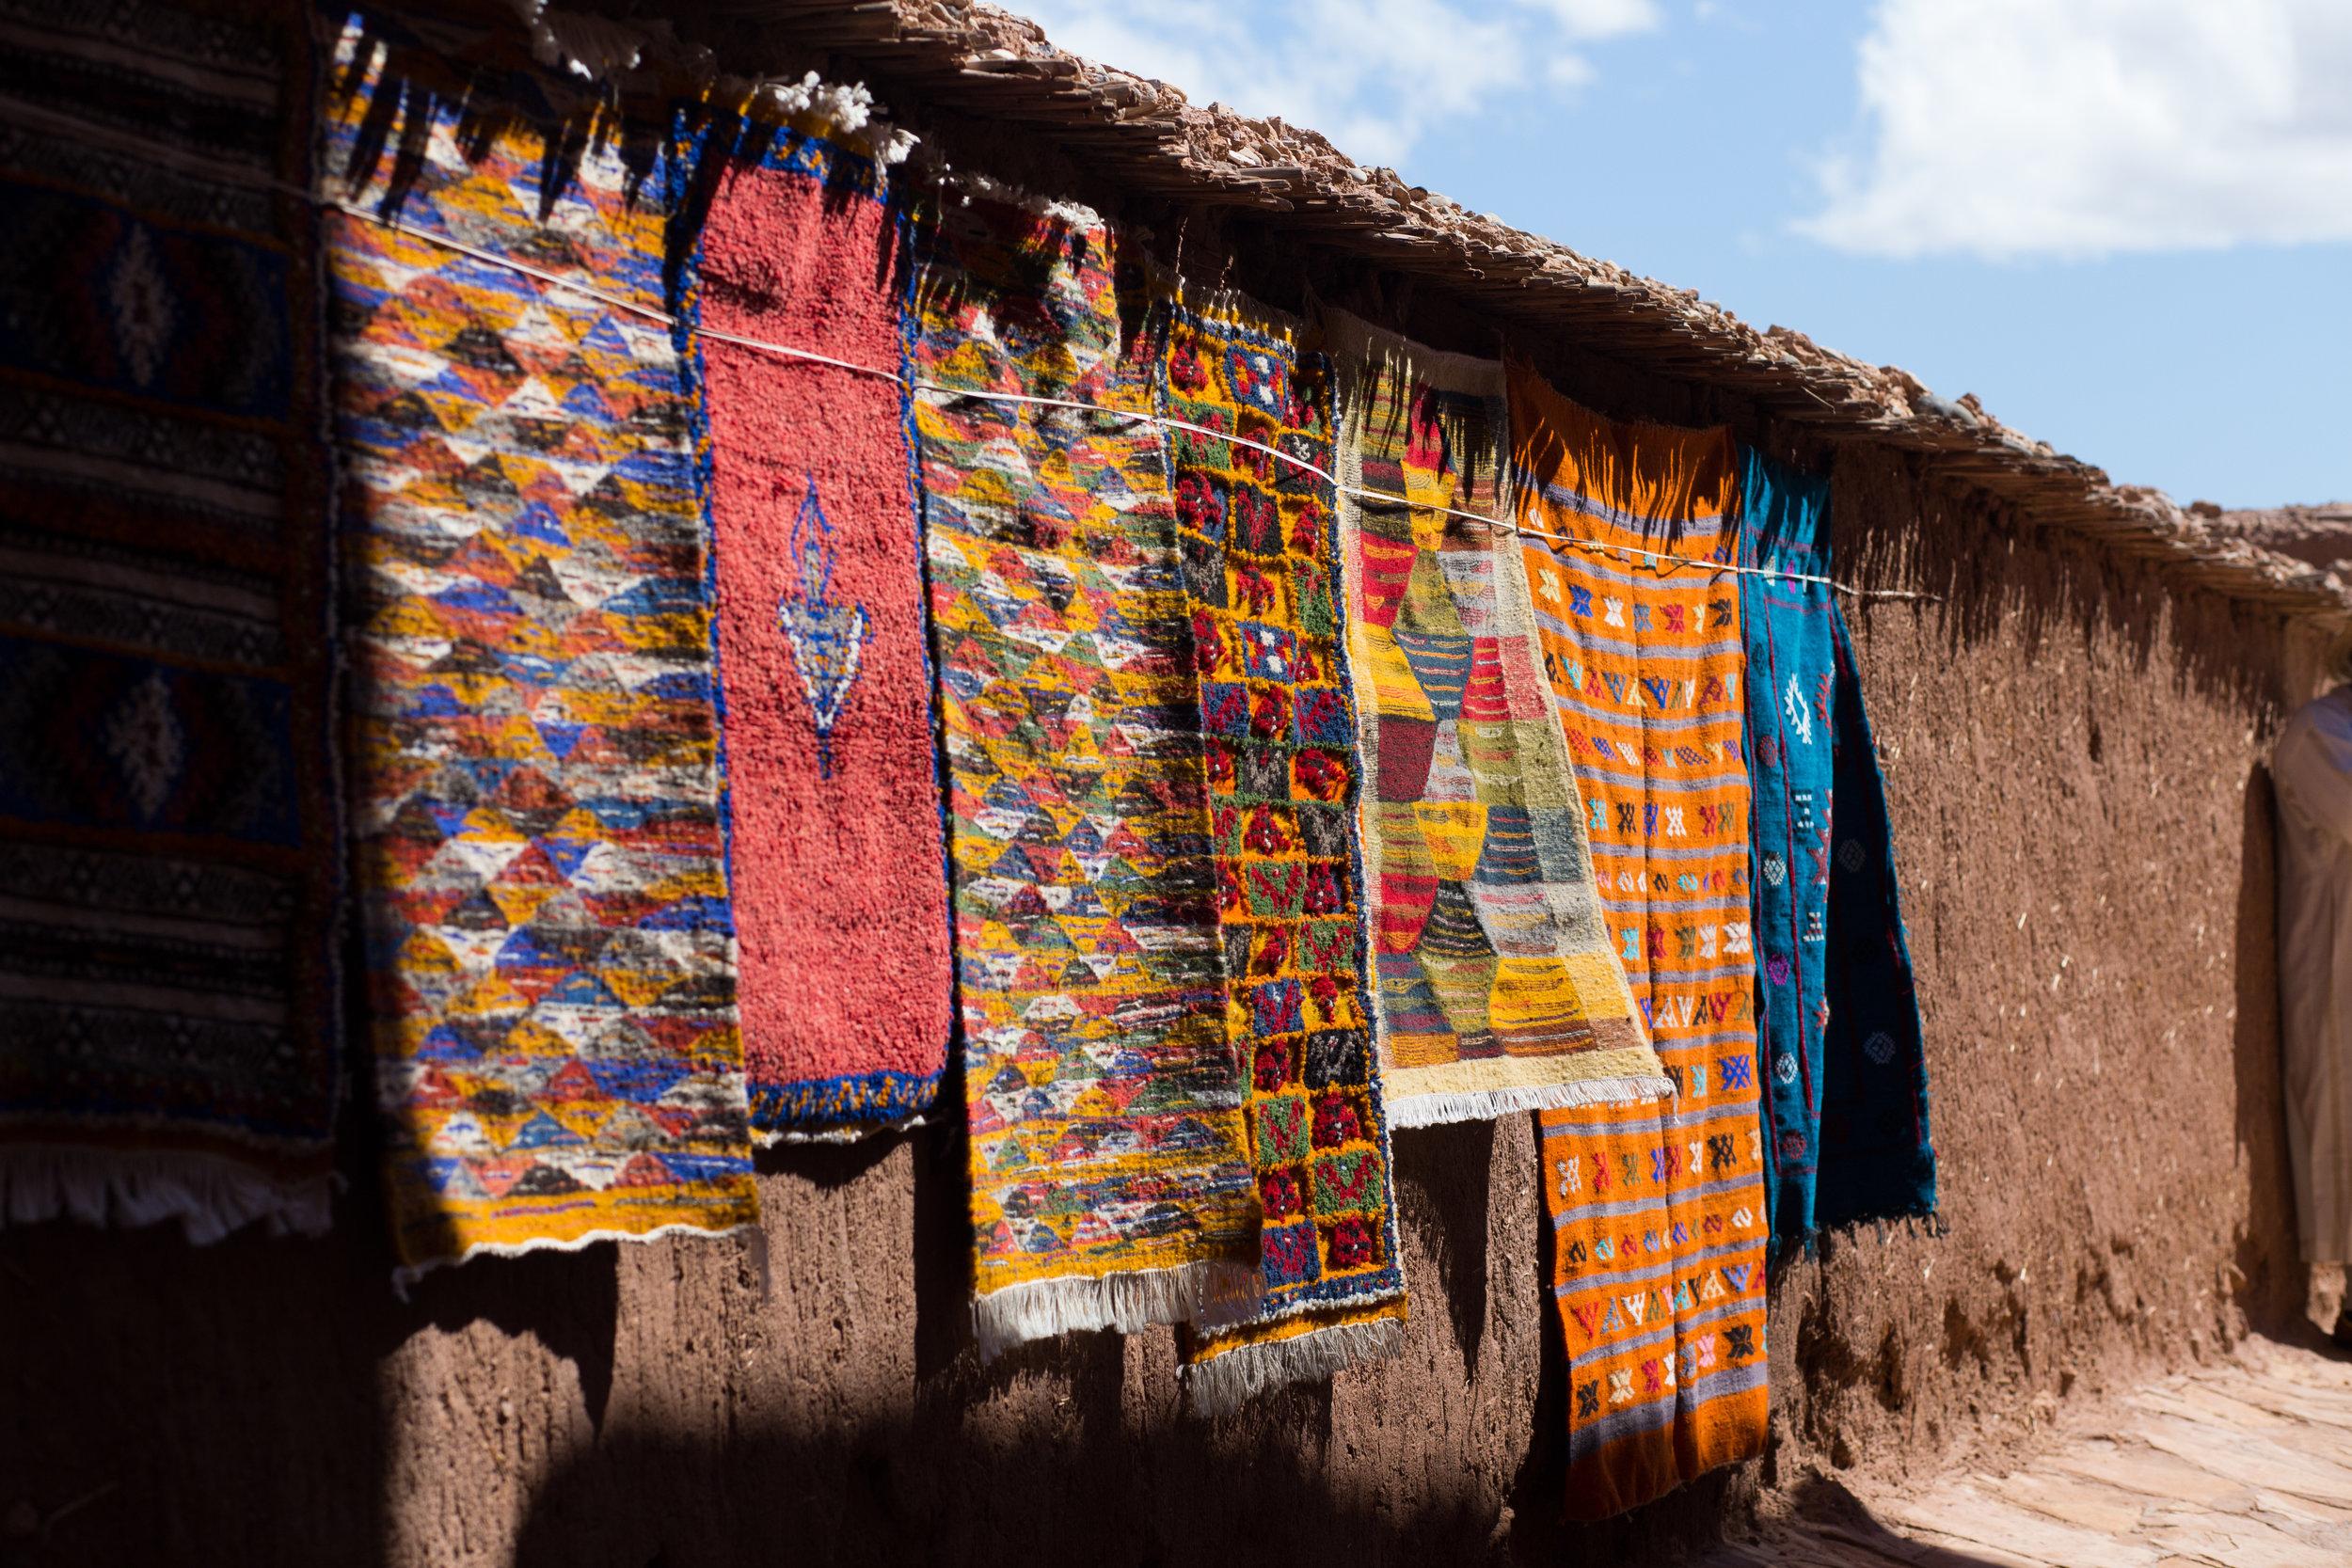 morocco-morocco travel-visit morocco-travel-travel photography-travel photographer-alina mendoza-alina mendoza photography-51.jpg